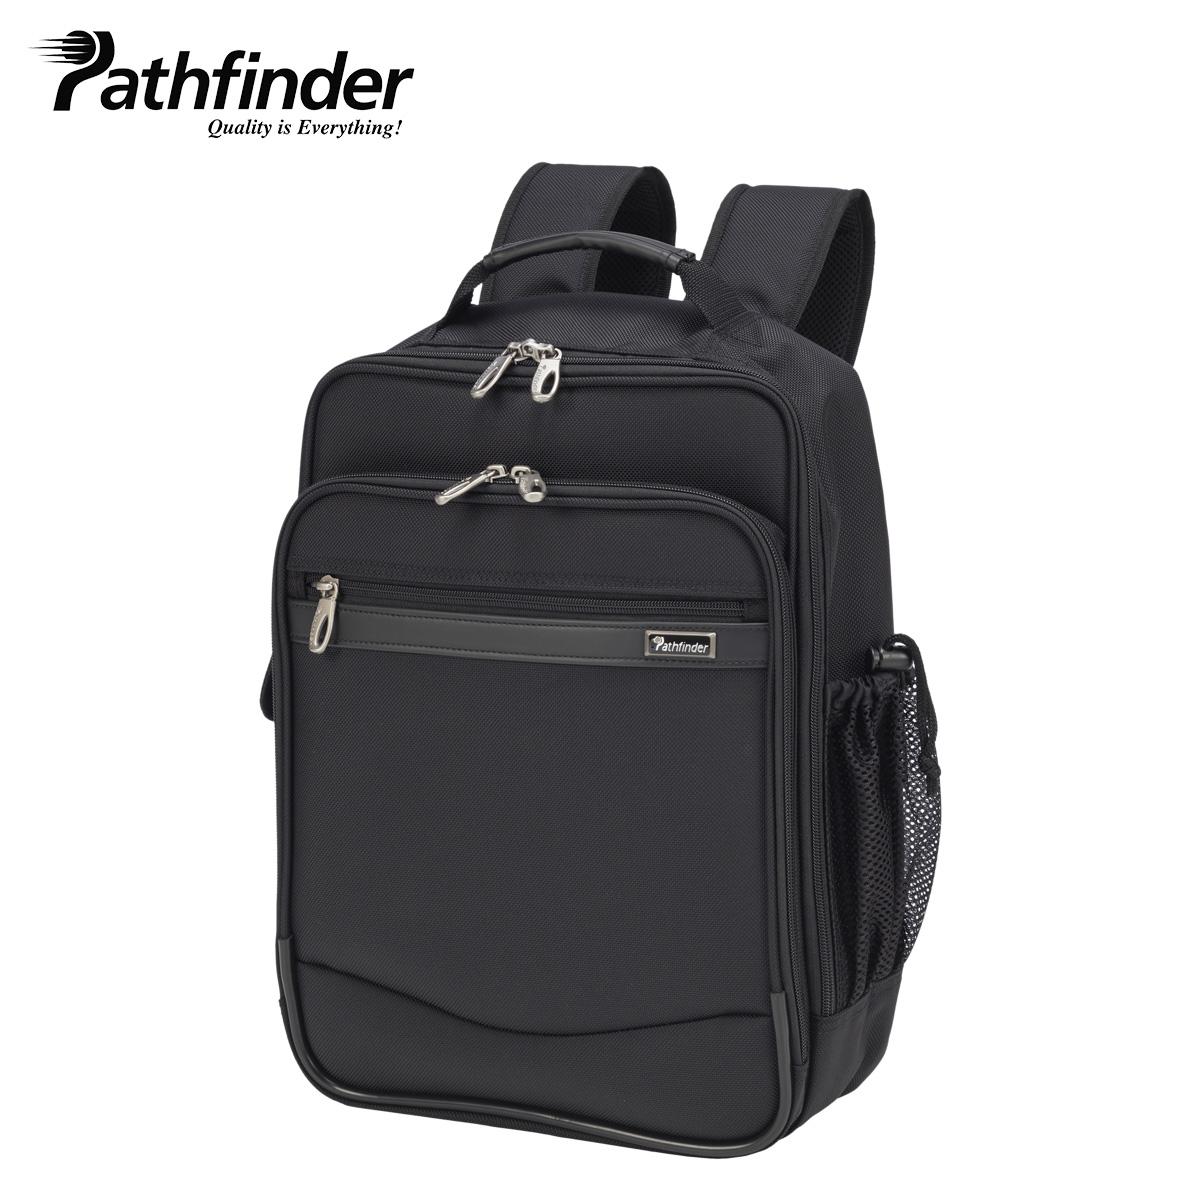 Pathfinder REVOLUTION XT パスファインダー バッグ ビジネスバッグ リュック バックパック メンズ ブラック 黒 PF6811B